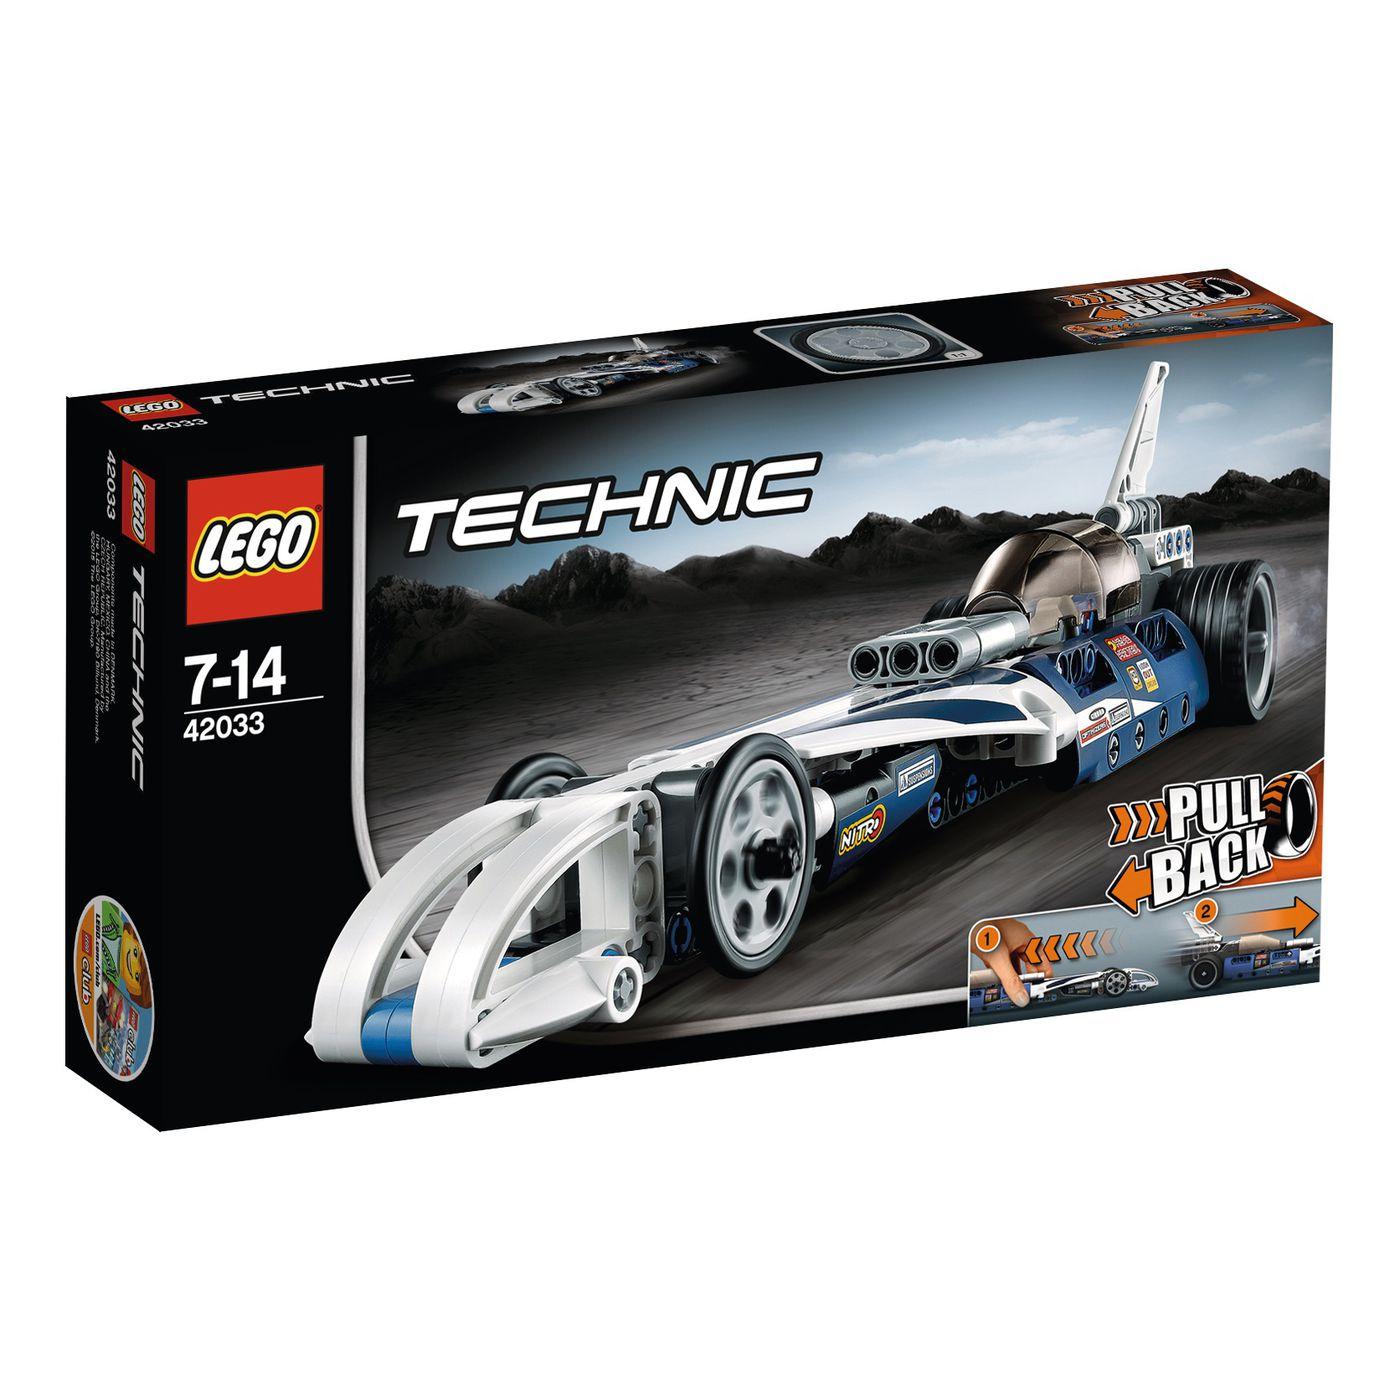 Lego Technic Action Raketenauto 42033 für 4,95€ zzgl. VSK anstatt 19,99€